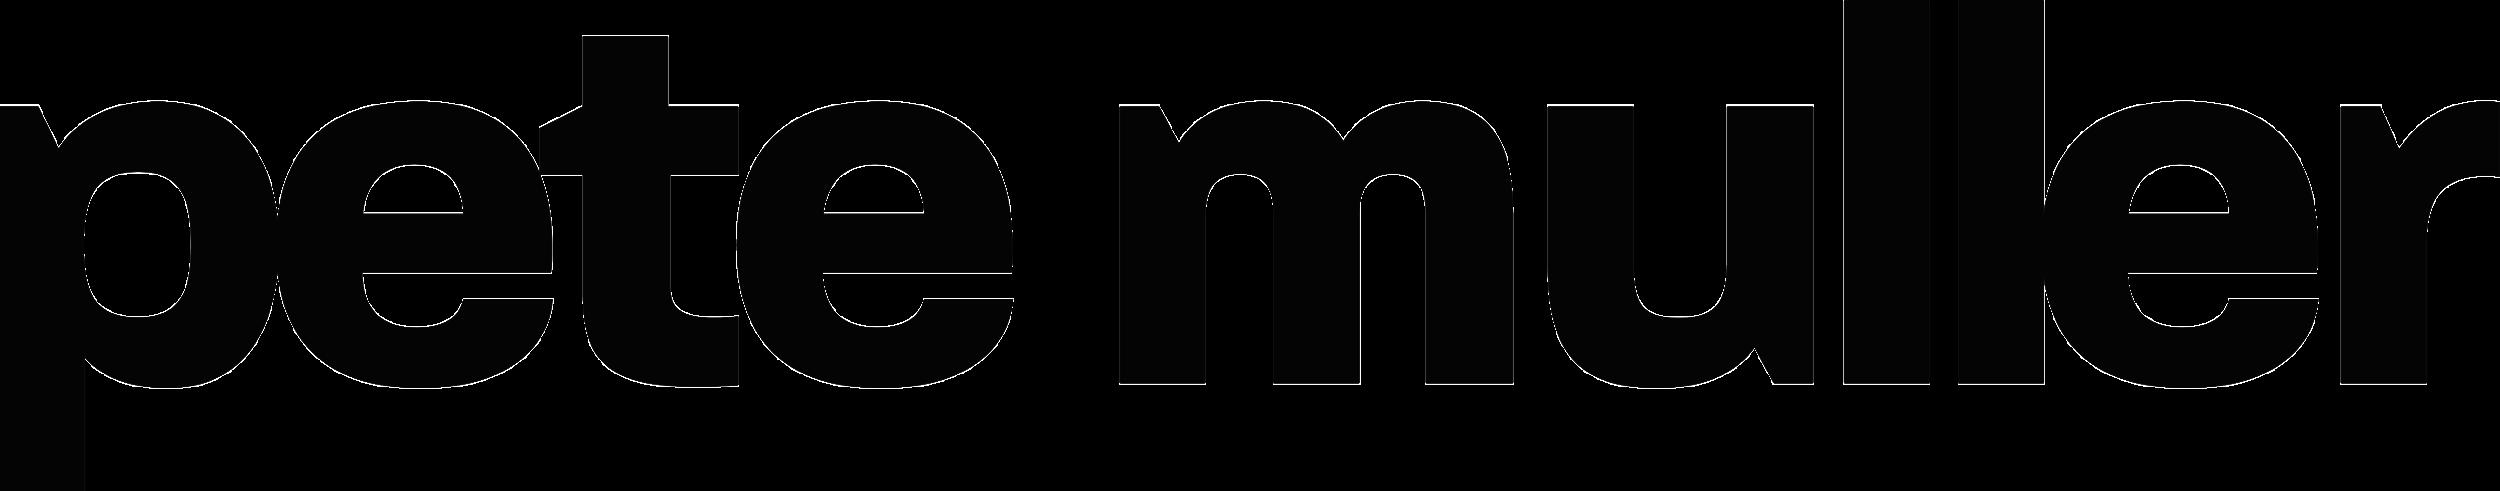 pete-muller-new-logo-black.png